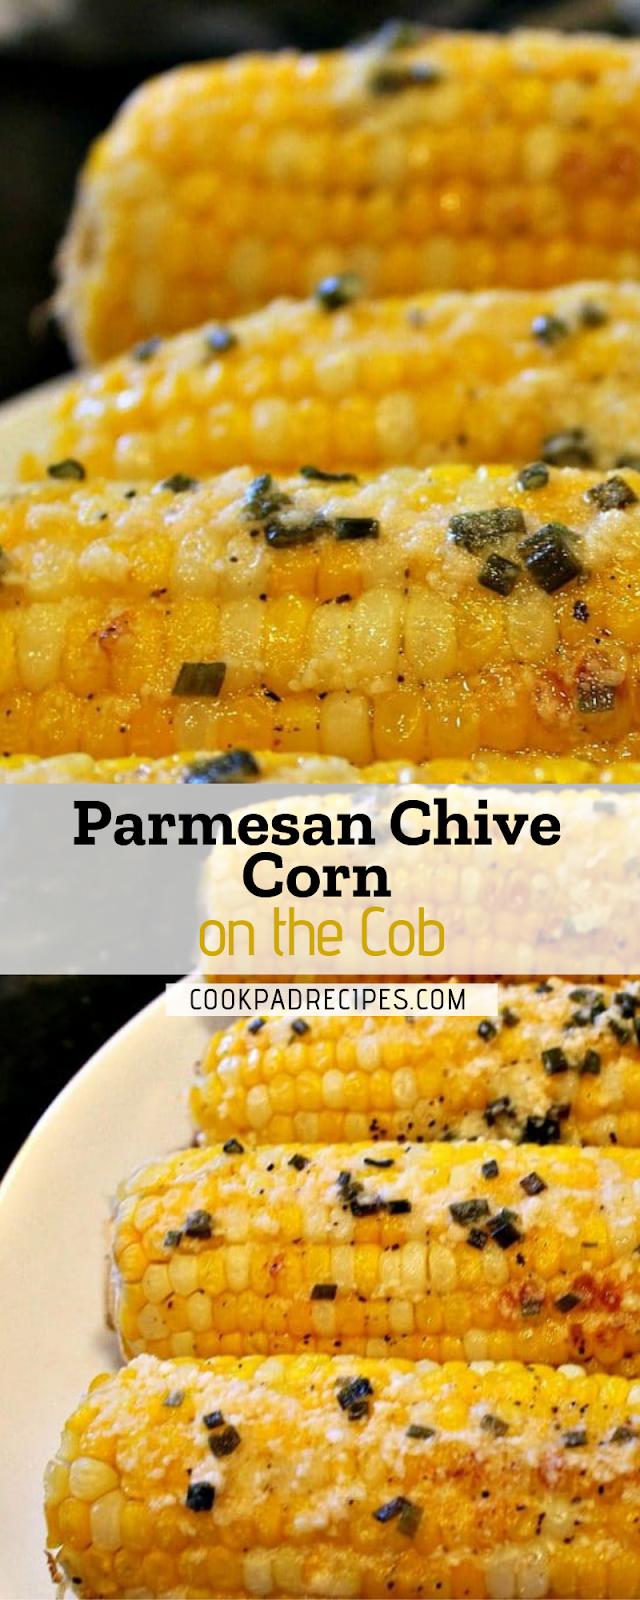 Parmesan Chіvе Corn оn the Cоb